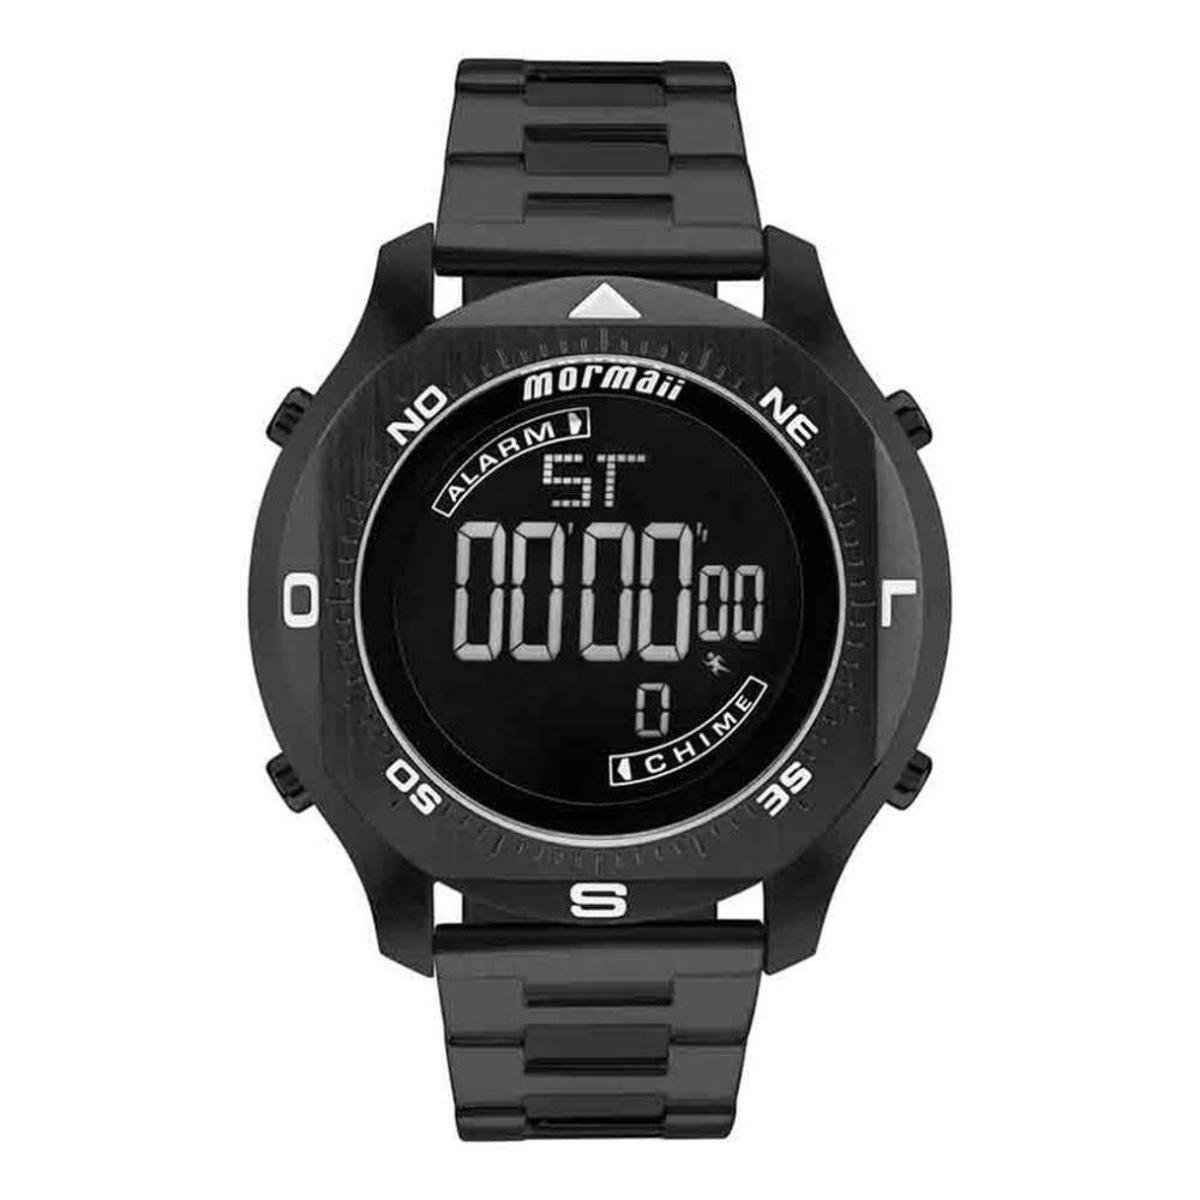 567b3386f7 Relógio Masculino Mormaii Pro Digital Mo11273b 4P - Compre Agora ...